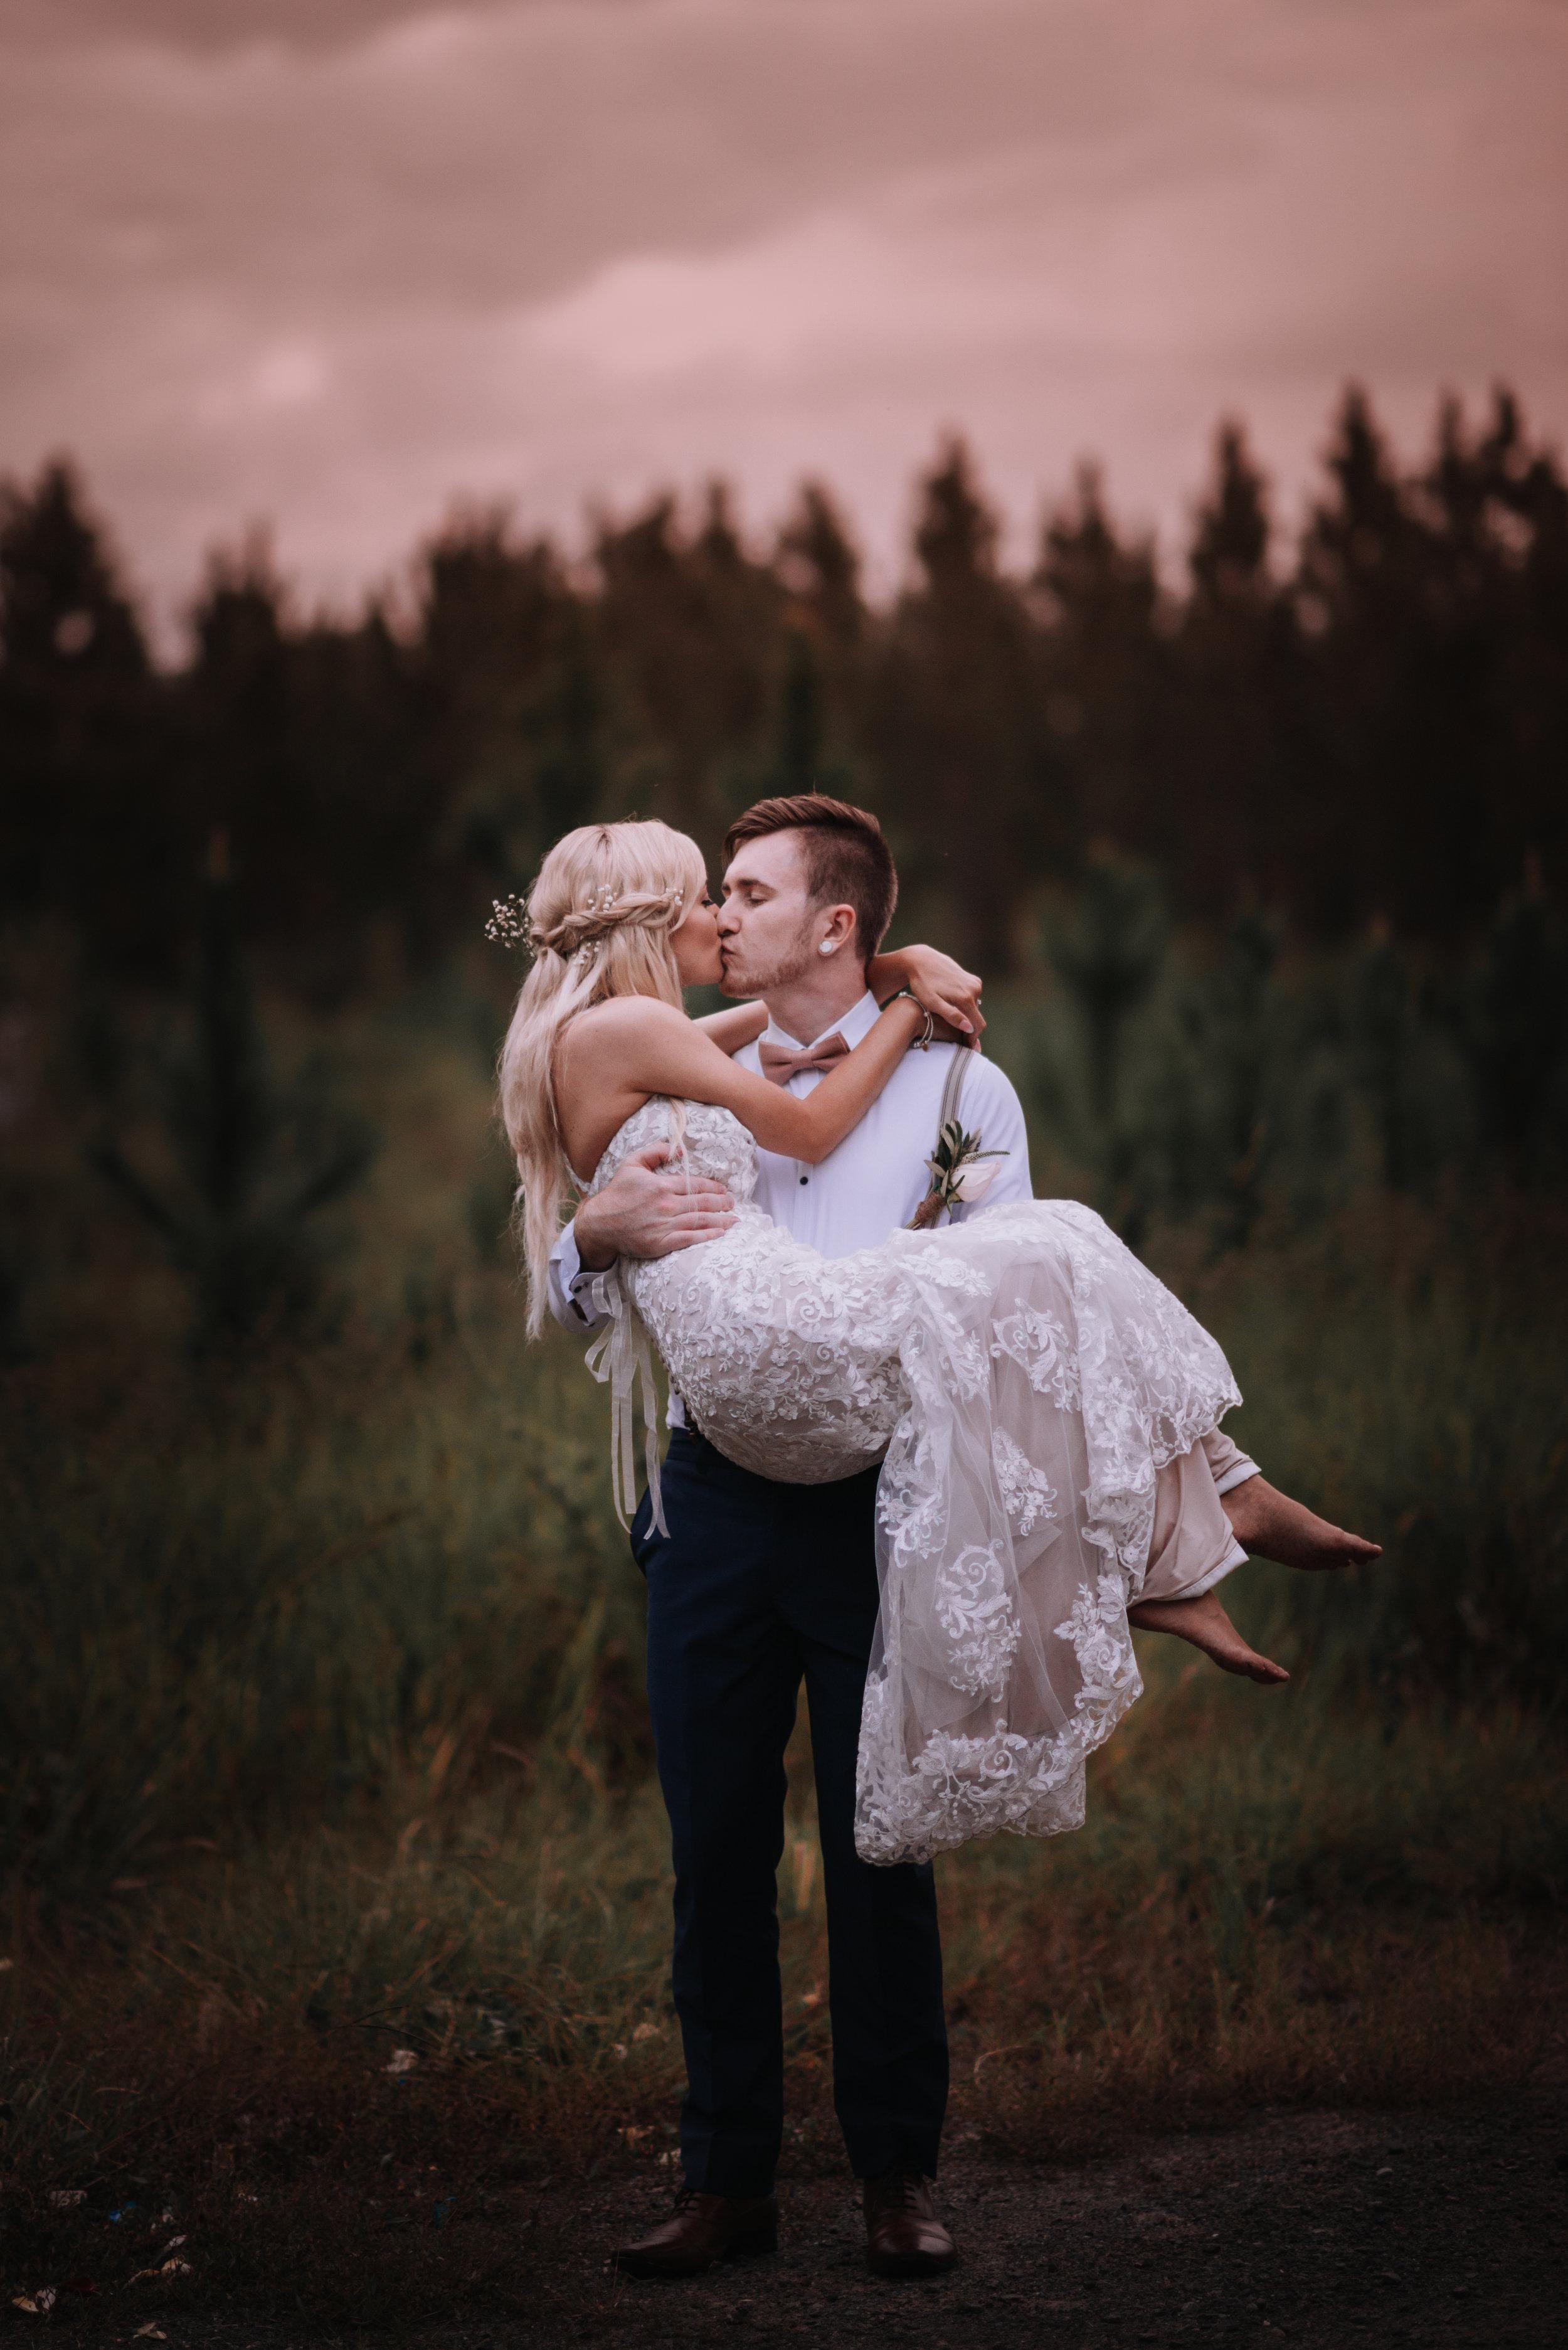 LOVELENSCAPES PHOTOGRAPHY o VISUAL POETRY o BRISBANE WEDDING PHOTOGRAPHER o AMY  TIM o BEERWAH HIDEAWAY o SUNSHINE COAST WEDDING o 3 o 24.jpg